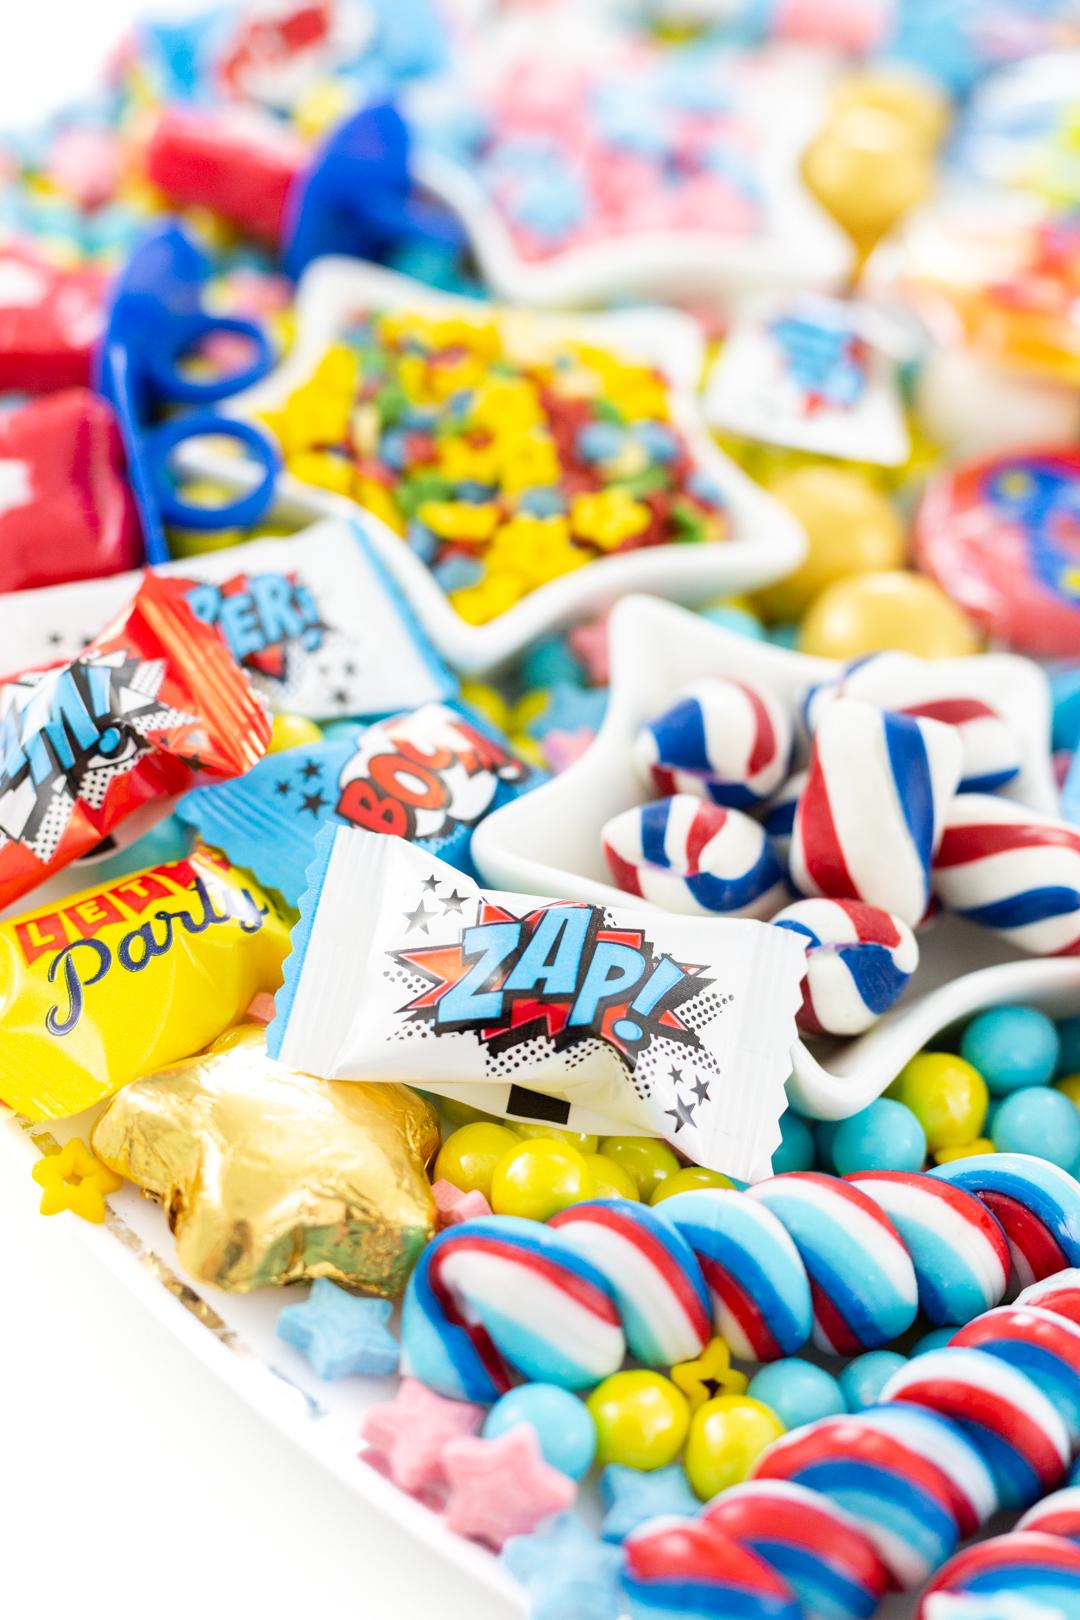 superhero candies with sayings like zap, bam.